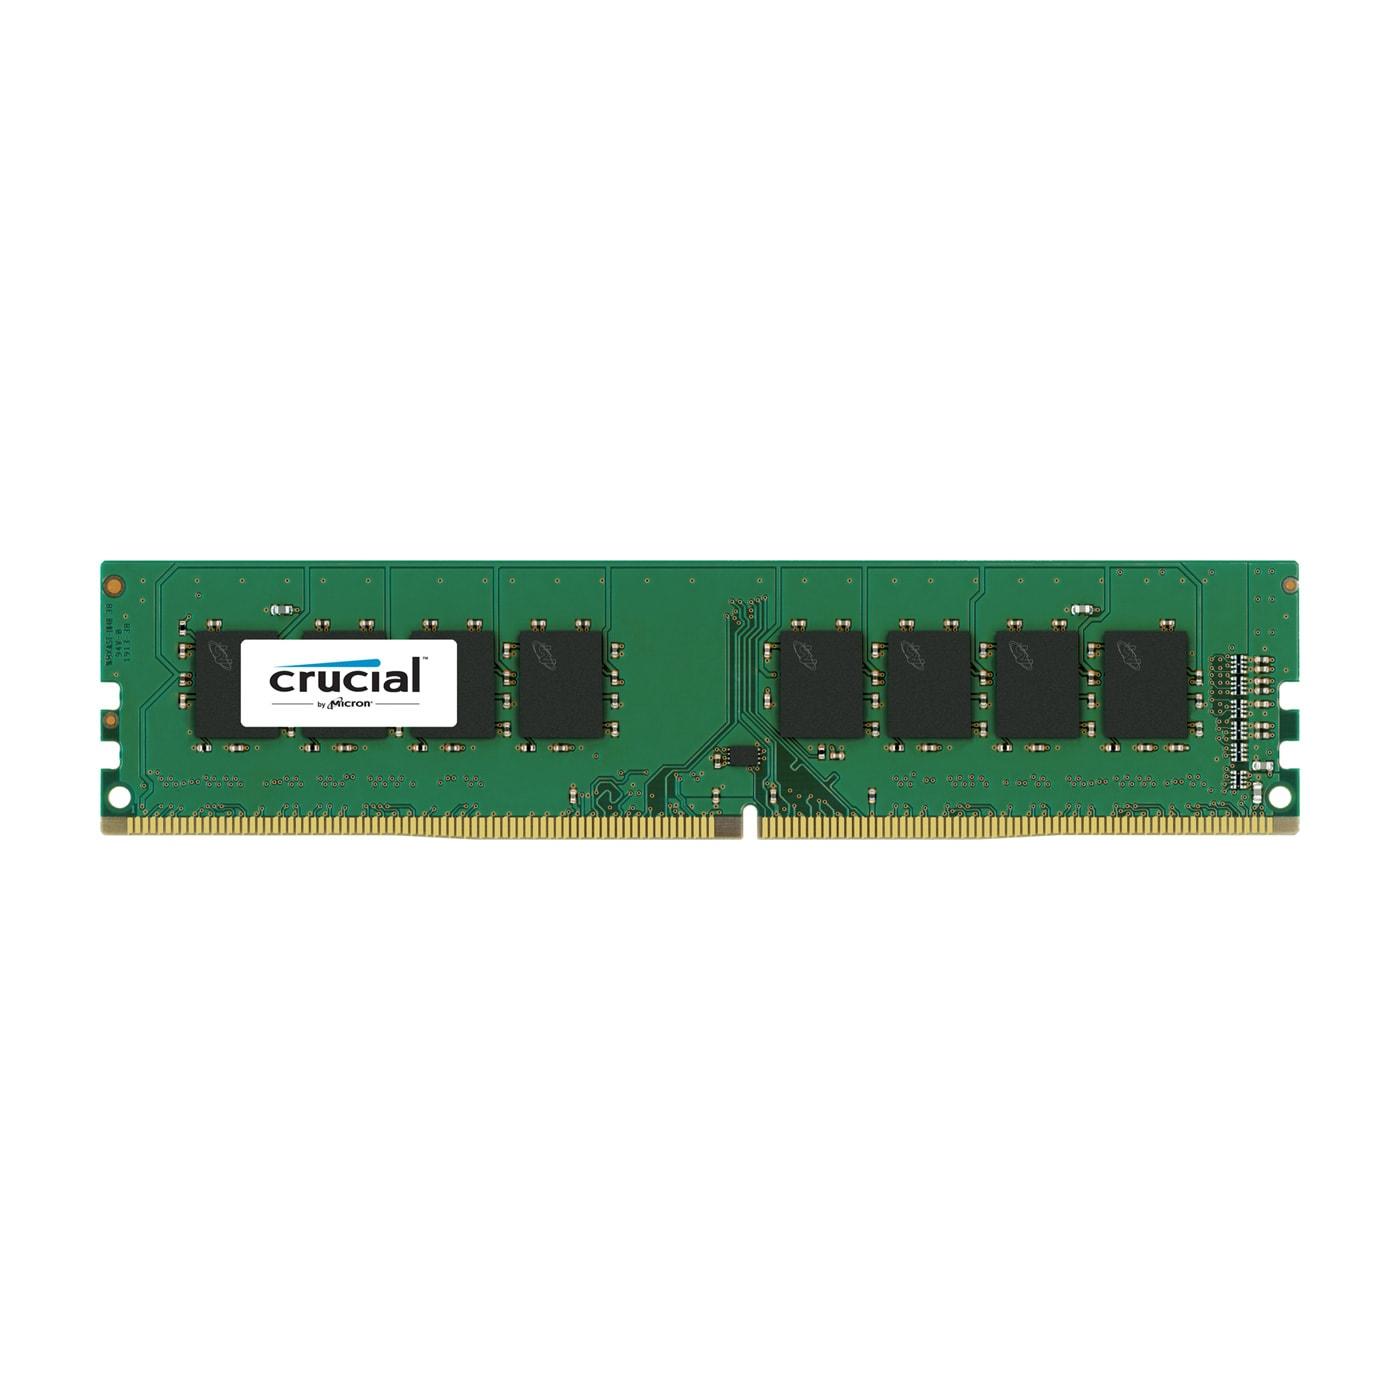 Crucial CT16G4RFS424A  16Go DDR4 2400MHz - Mémoire PC Crucial - 0